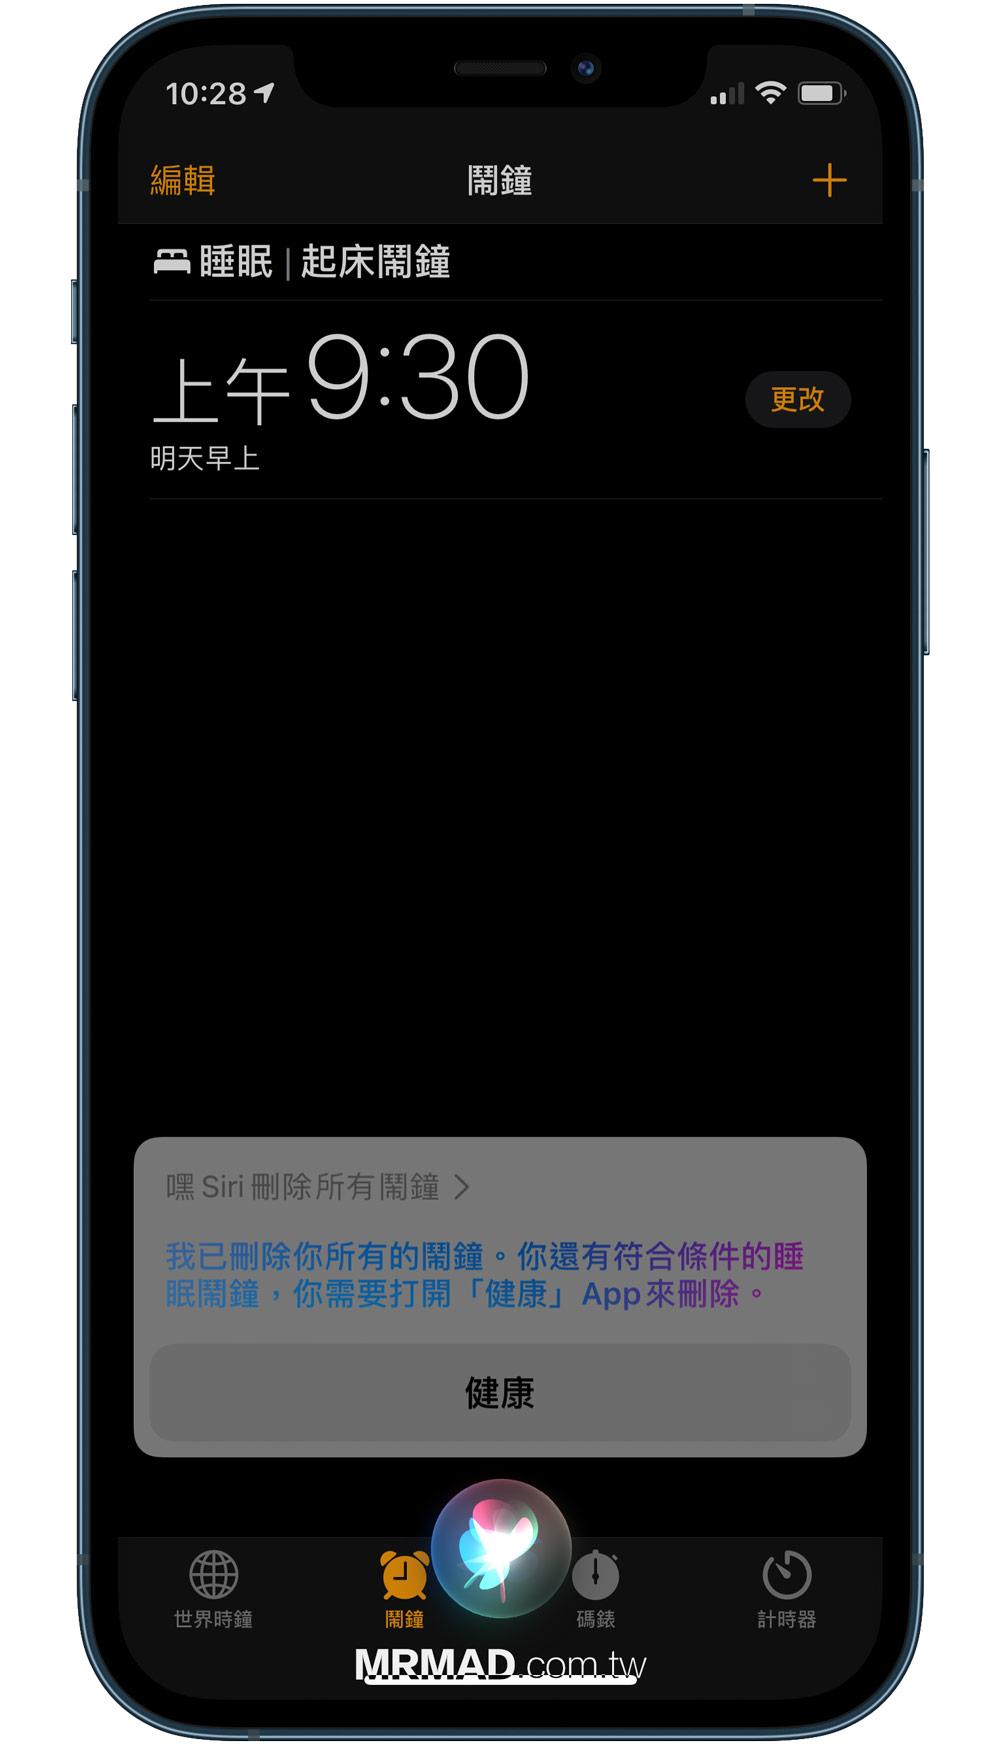 iPhone如何快速刪除所有鬧鐘?教你用Siri輕鬆刪除鬧鐘設定4